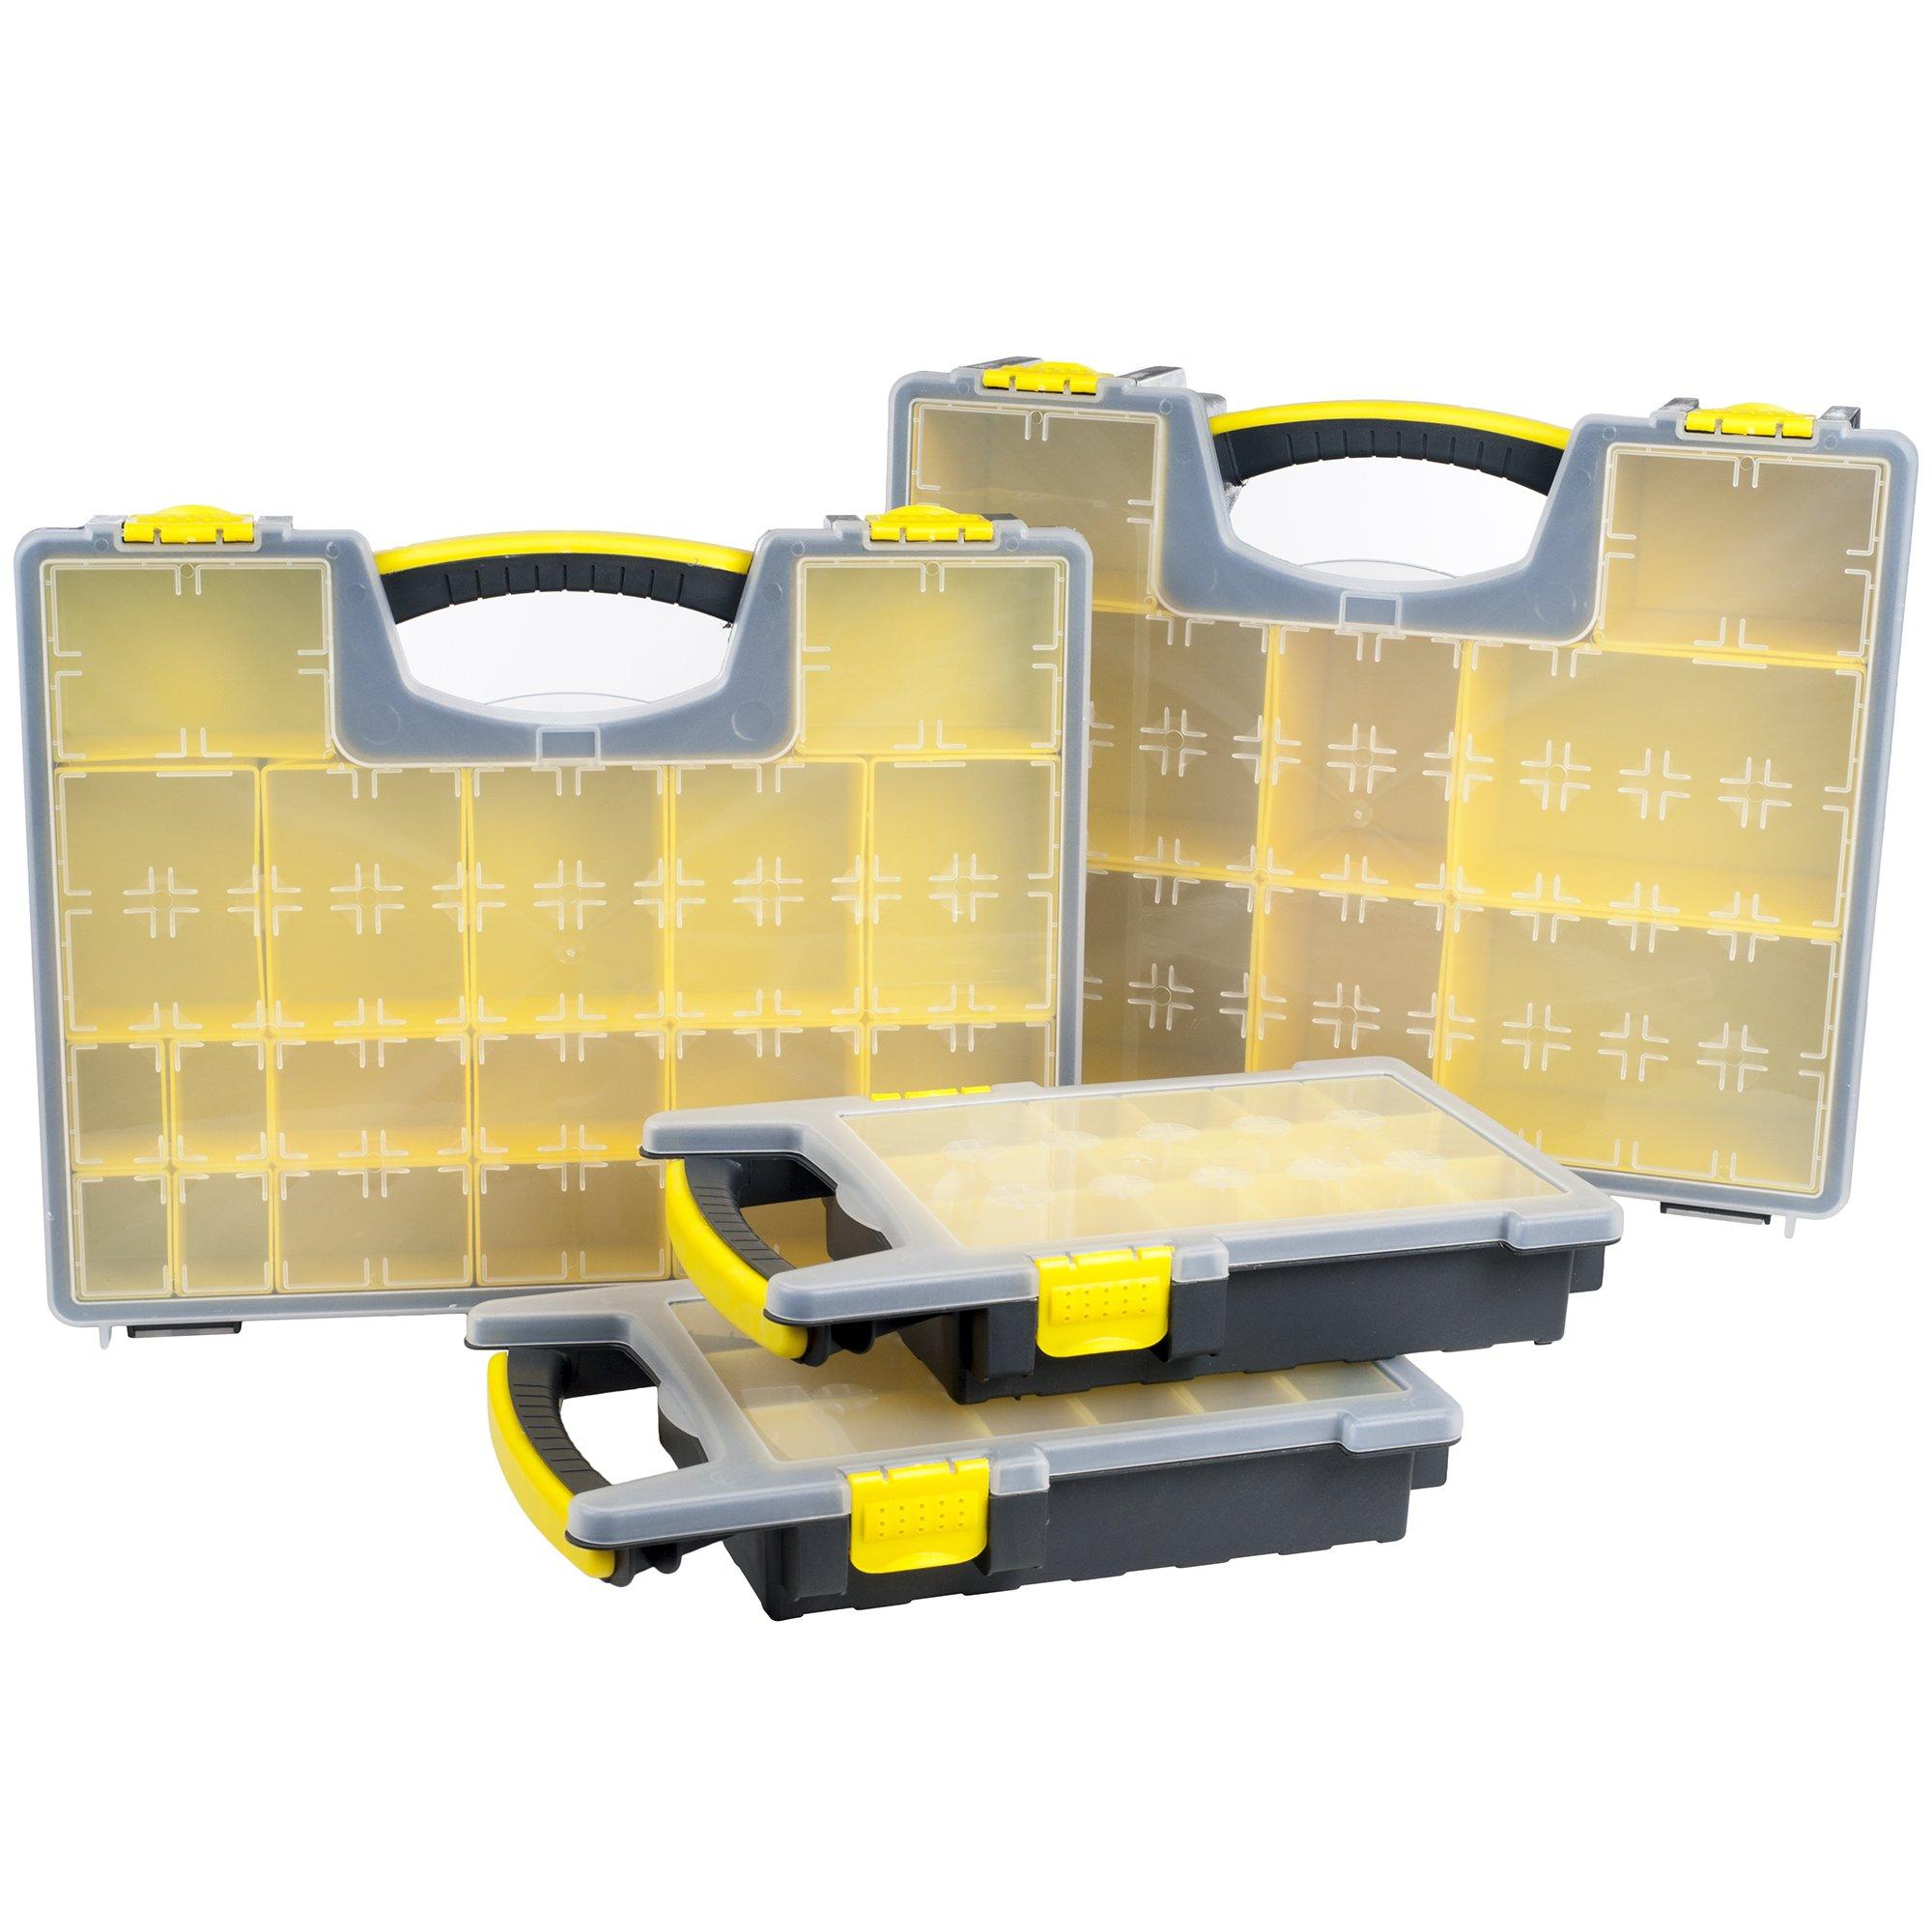 Stalwart 75-MJ4645102 Parts and Crafts Portable Storage Organizer Box (Set of 4) by Stalwart